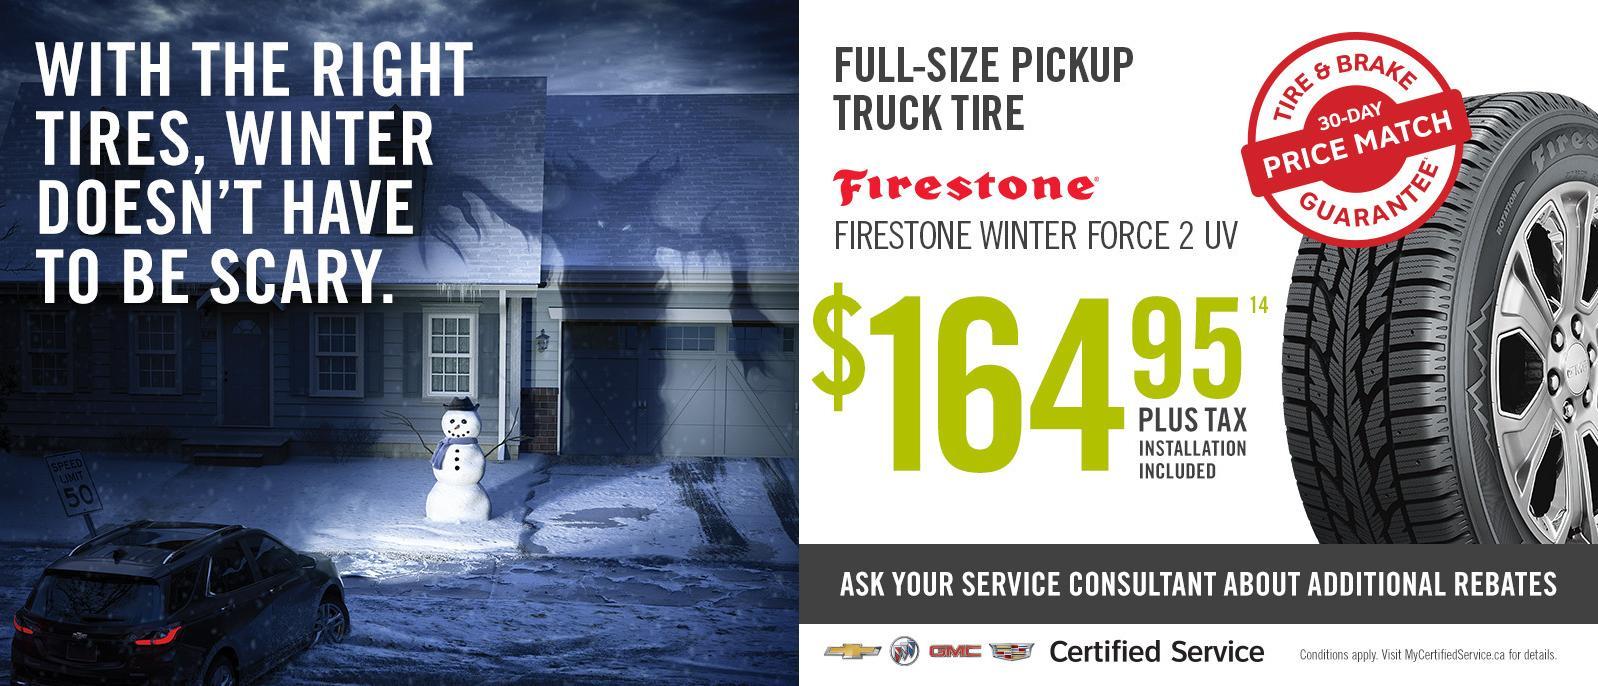 Winter Tire Special Deal Pickup Truck Goodyear from $99.95 VanDusen Ajax Ontario